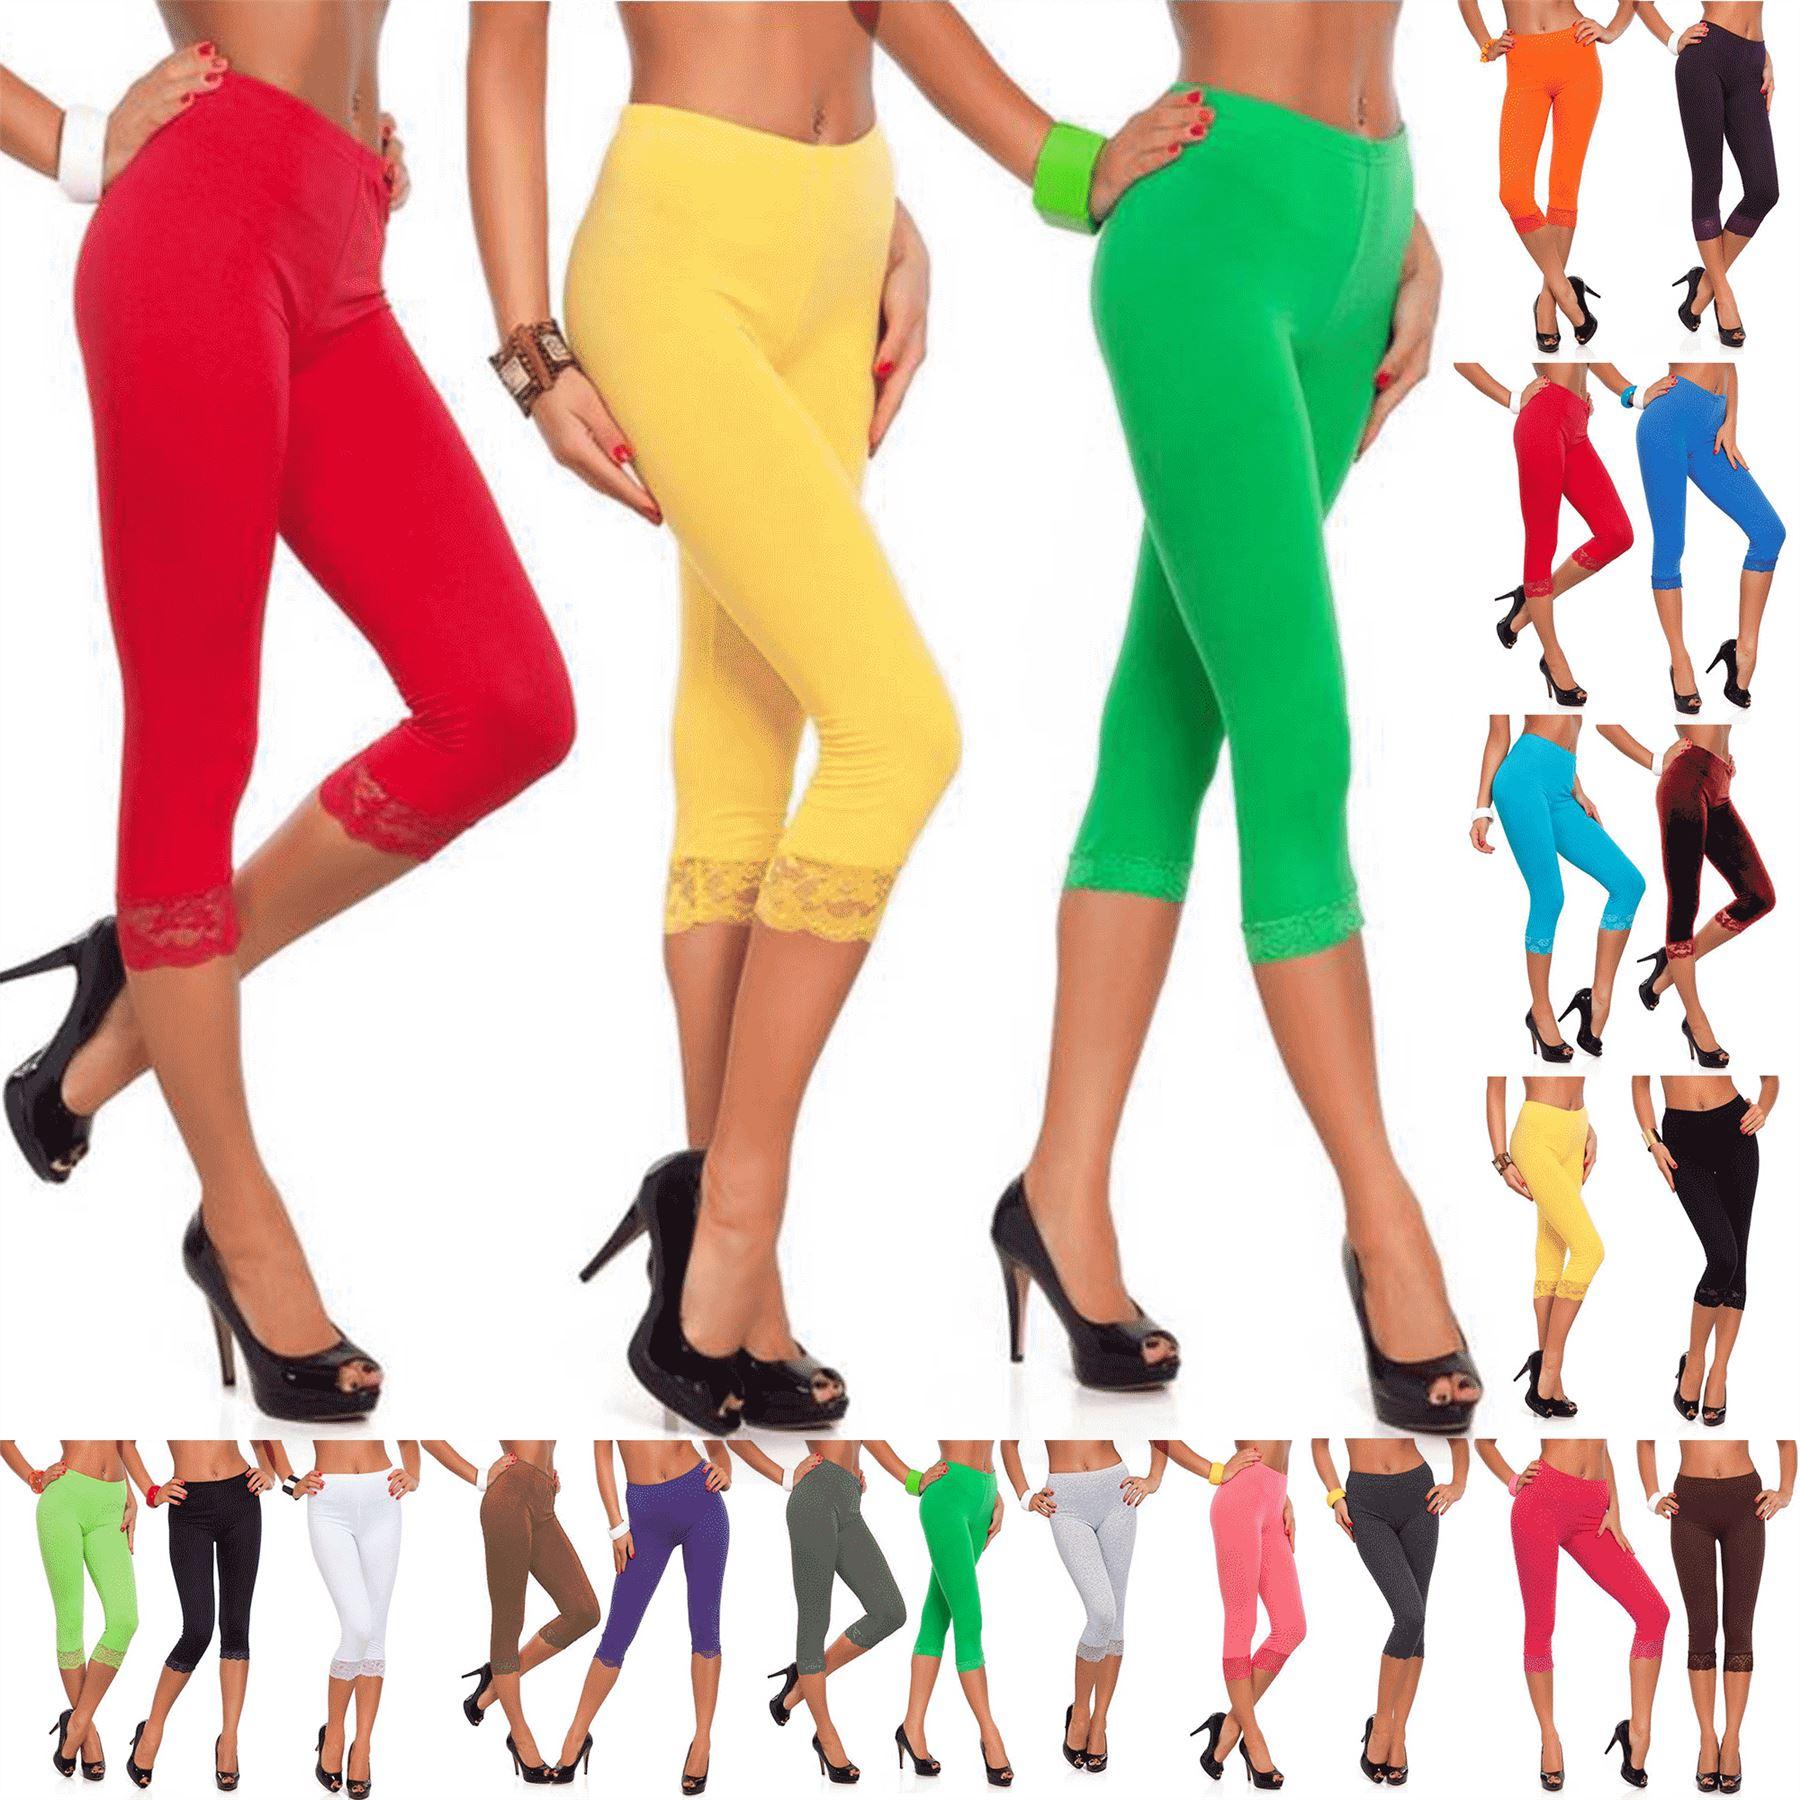 Womens Ladies 3/4 Length Lace Trim Edge Cropped Jog Bottoms Jeggings Leggings